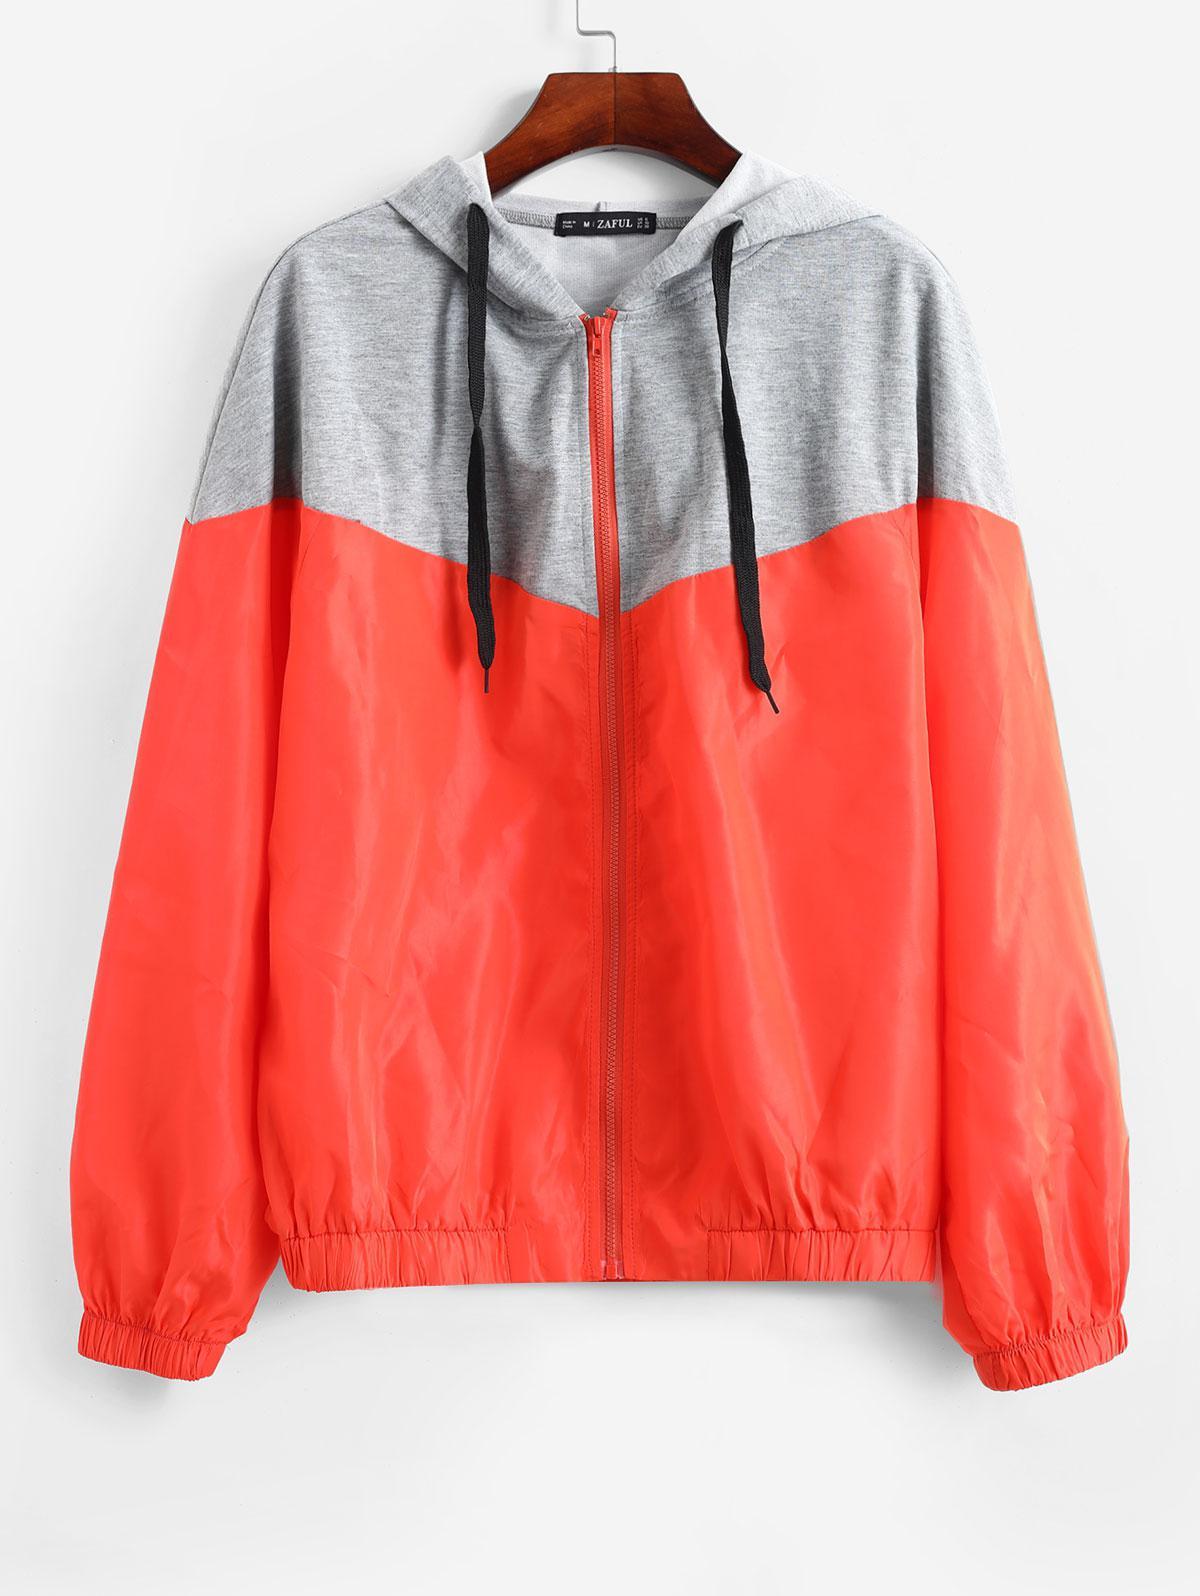 ZAFUL Mixed Media Two Tone Hooded Zip Windbreaker Jacket, Orange